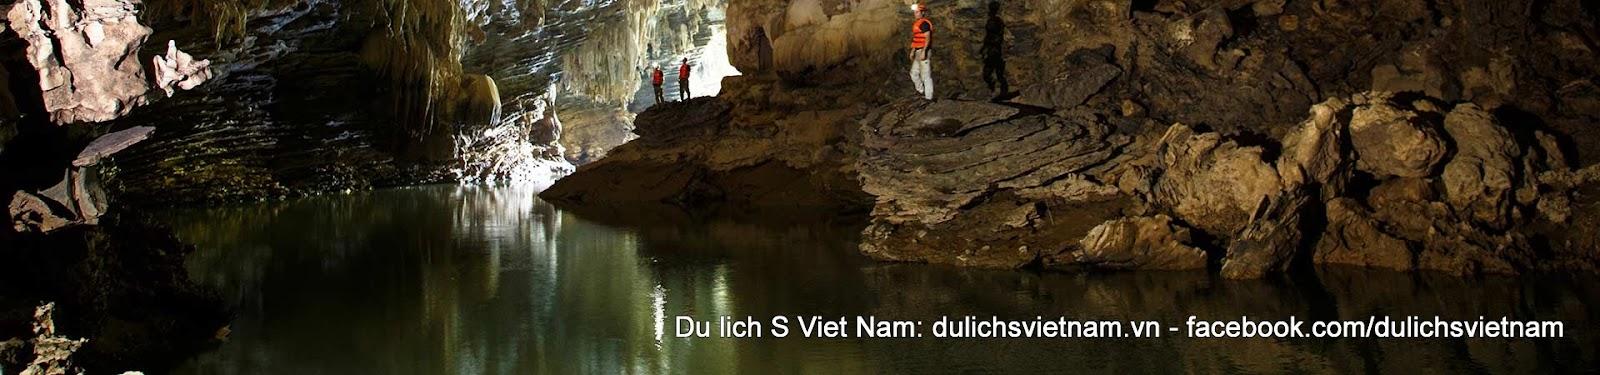 The Tu Lan Cave System in Tan Hoa village, Minh Hoa District, Quang Binh